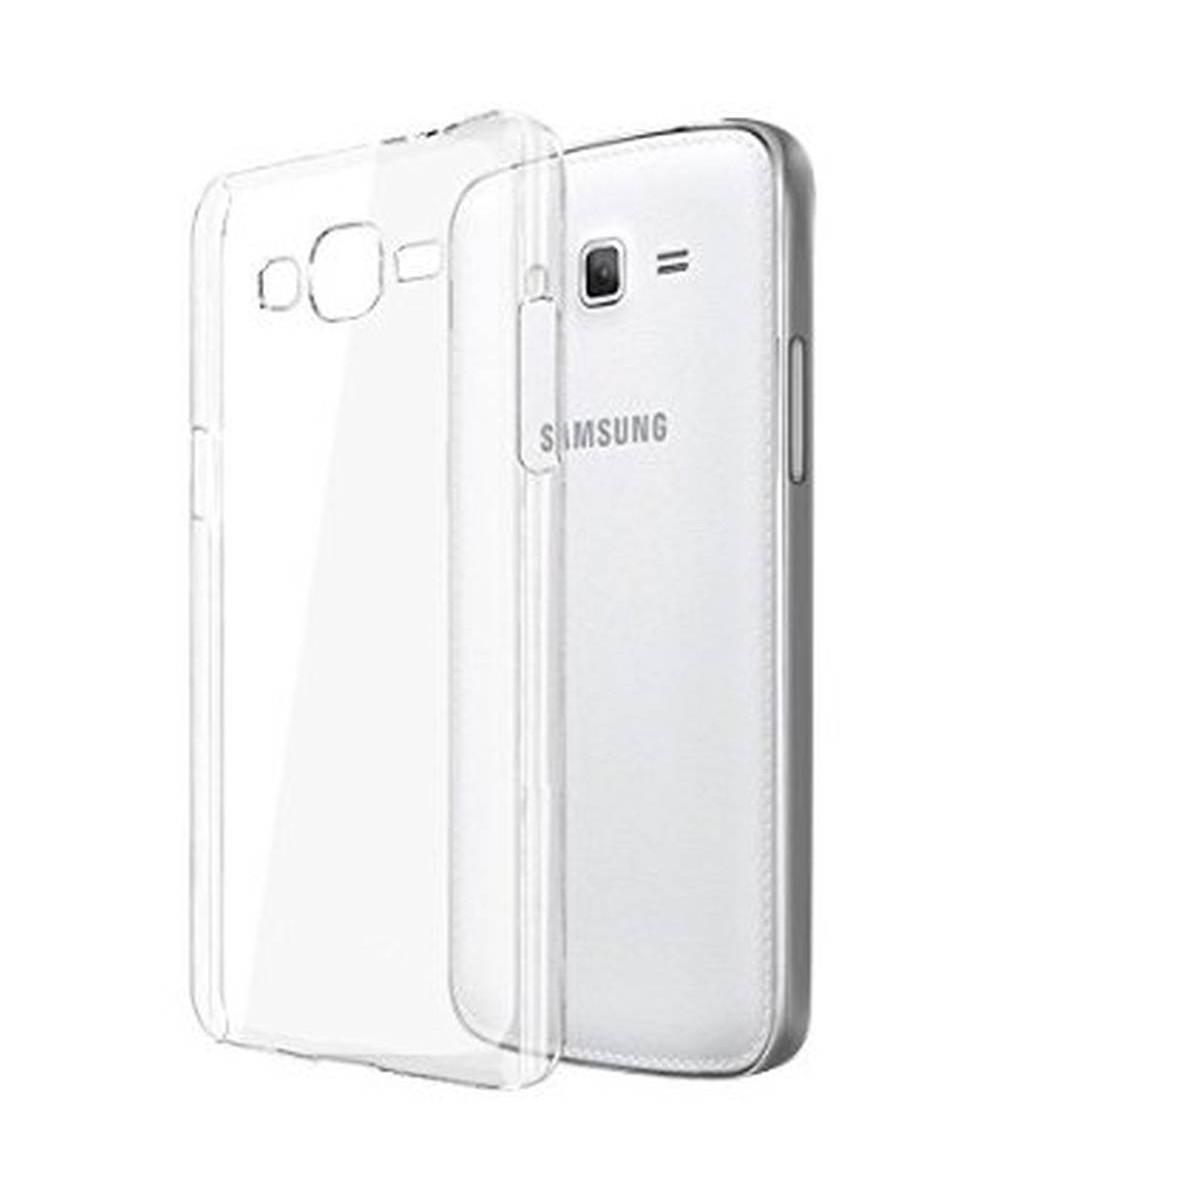 hot sale online 738b8 39972 Transparent Back Case for Samsung Galaxy Core Prime 4G